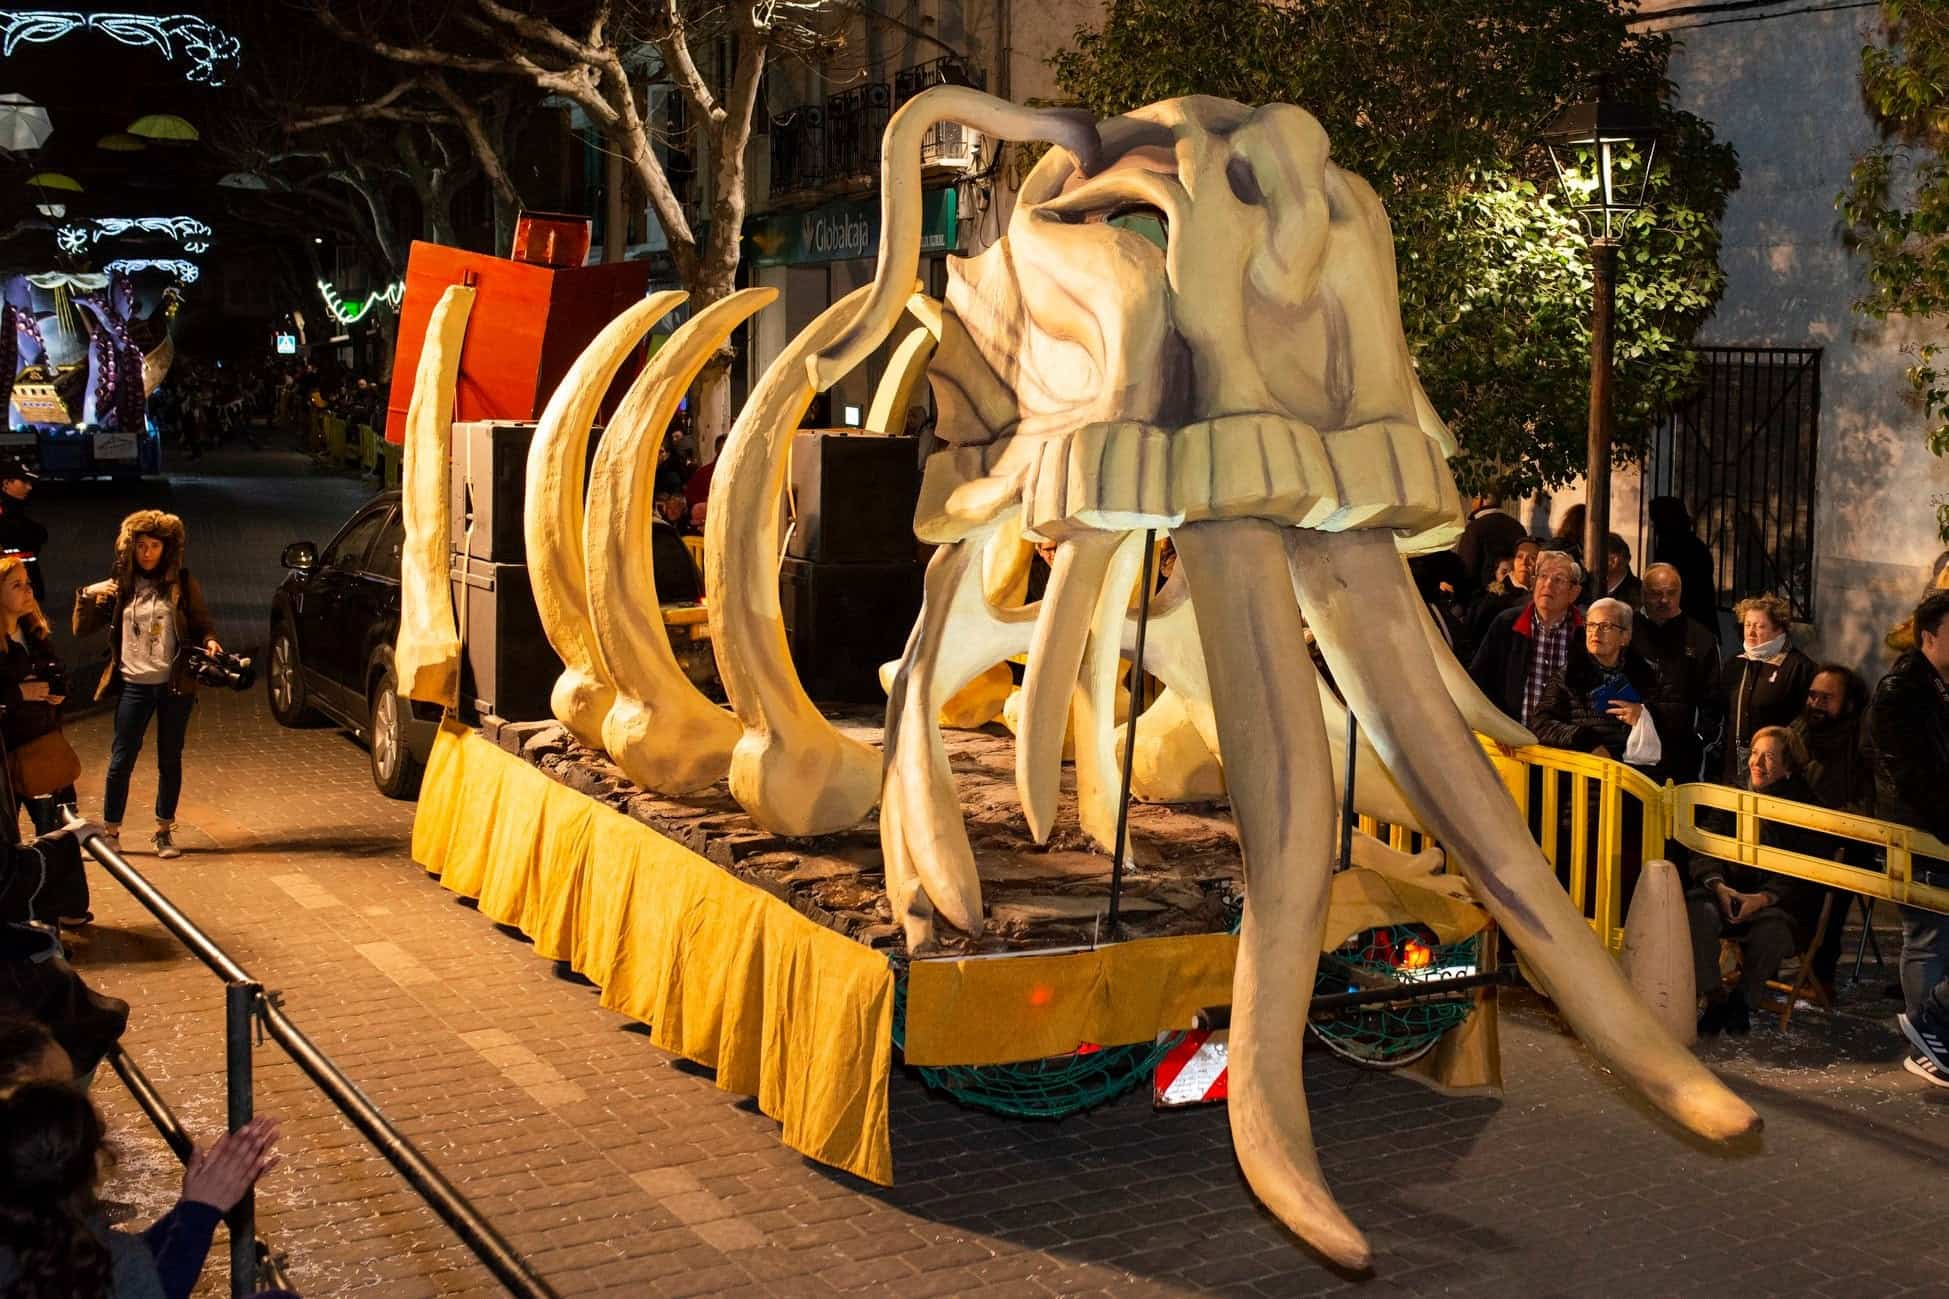 Carnaval de herencia 2020 ofertorio 27 - Selección de fotografías del Ofertorio del Carnaval de Herencia